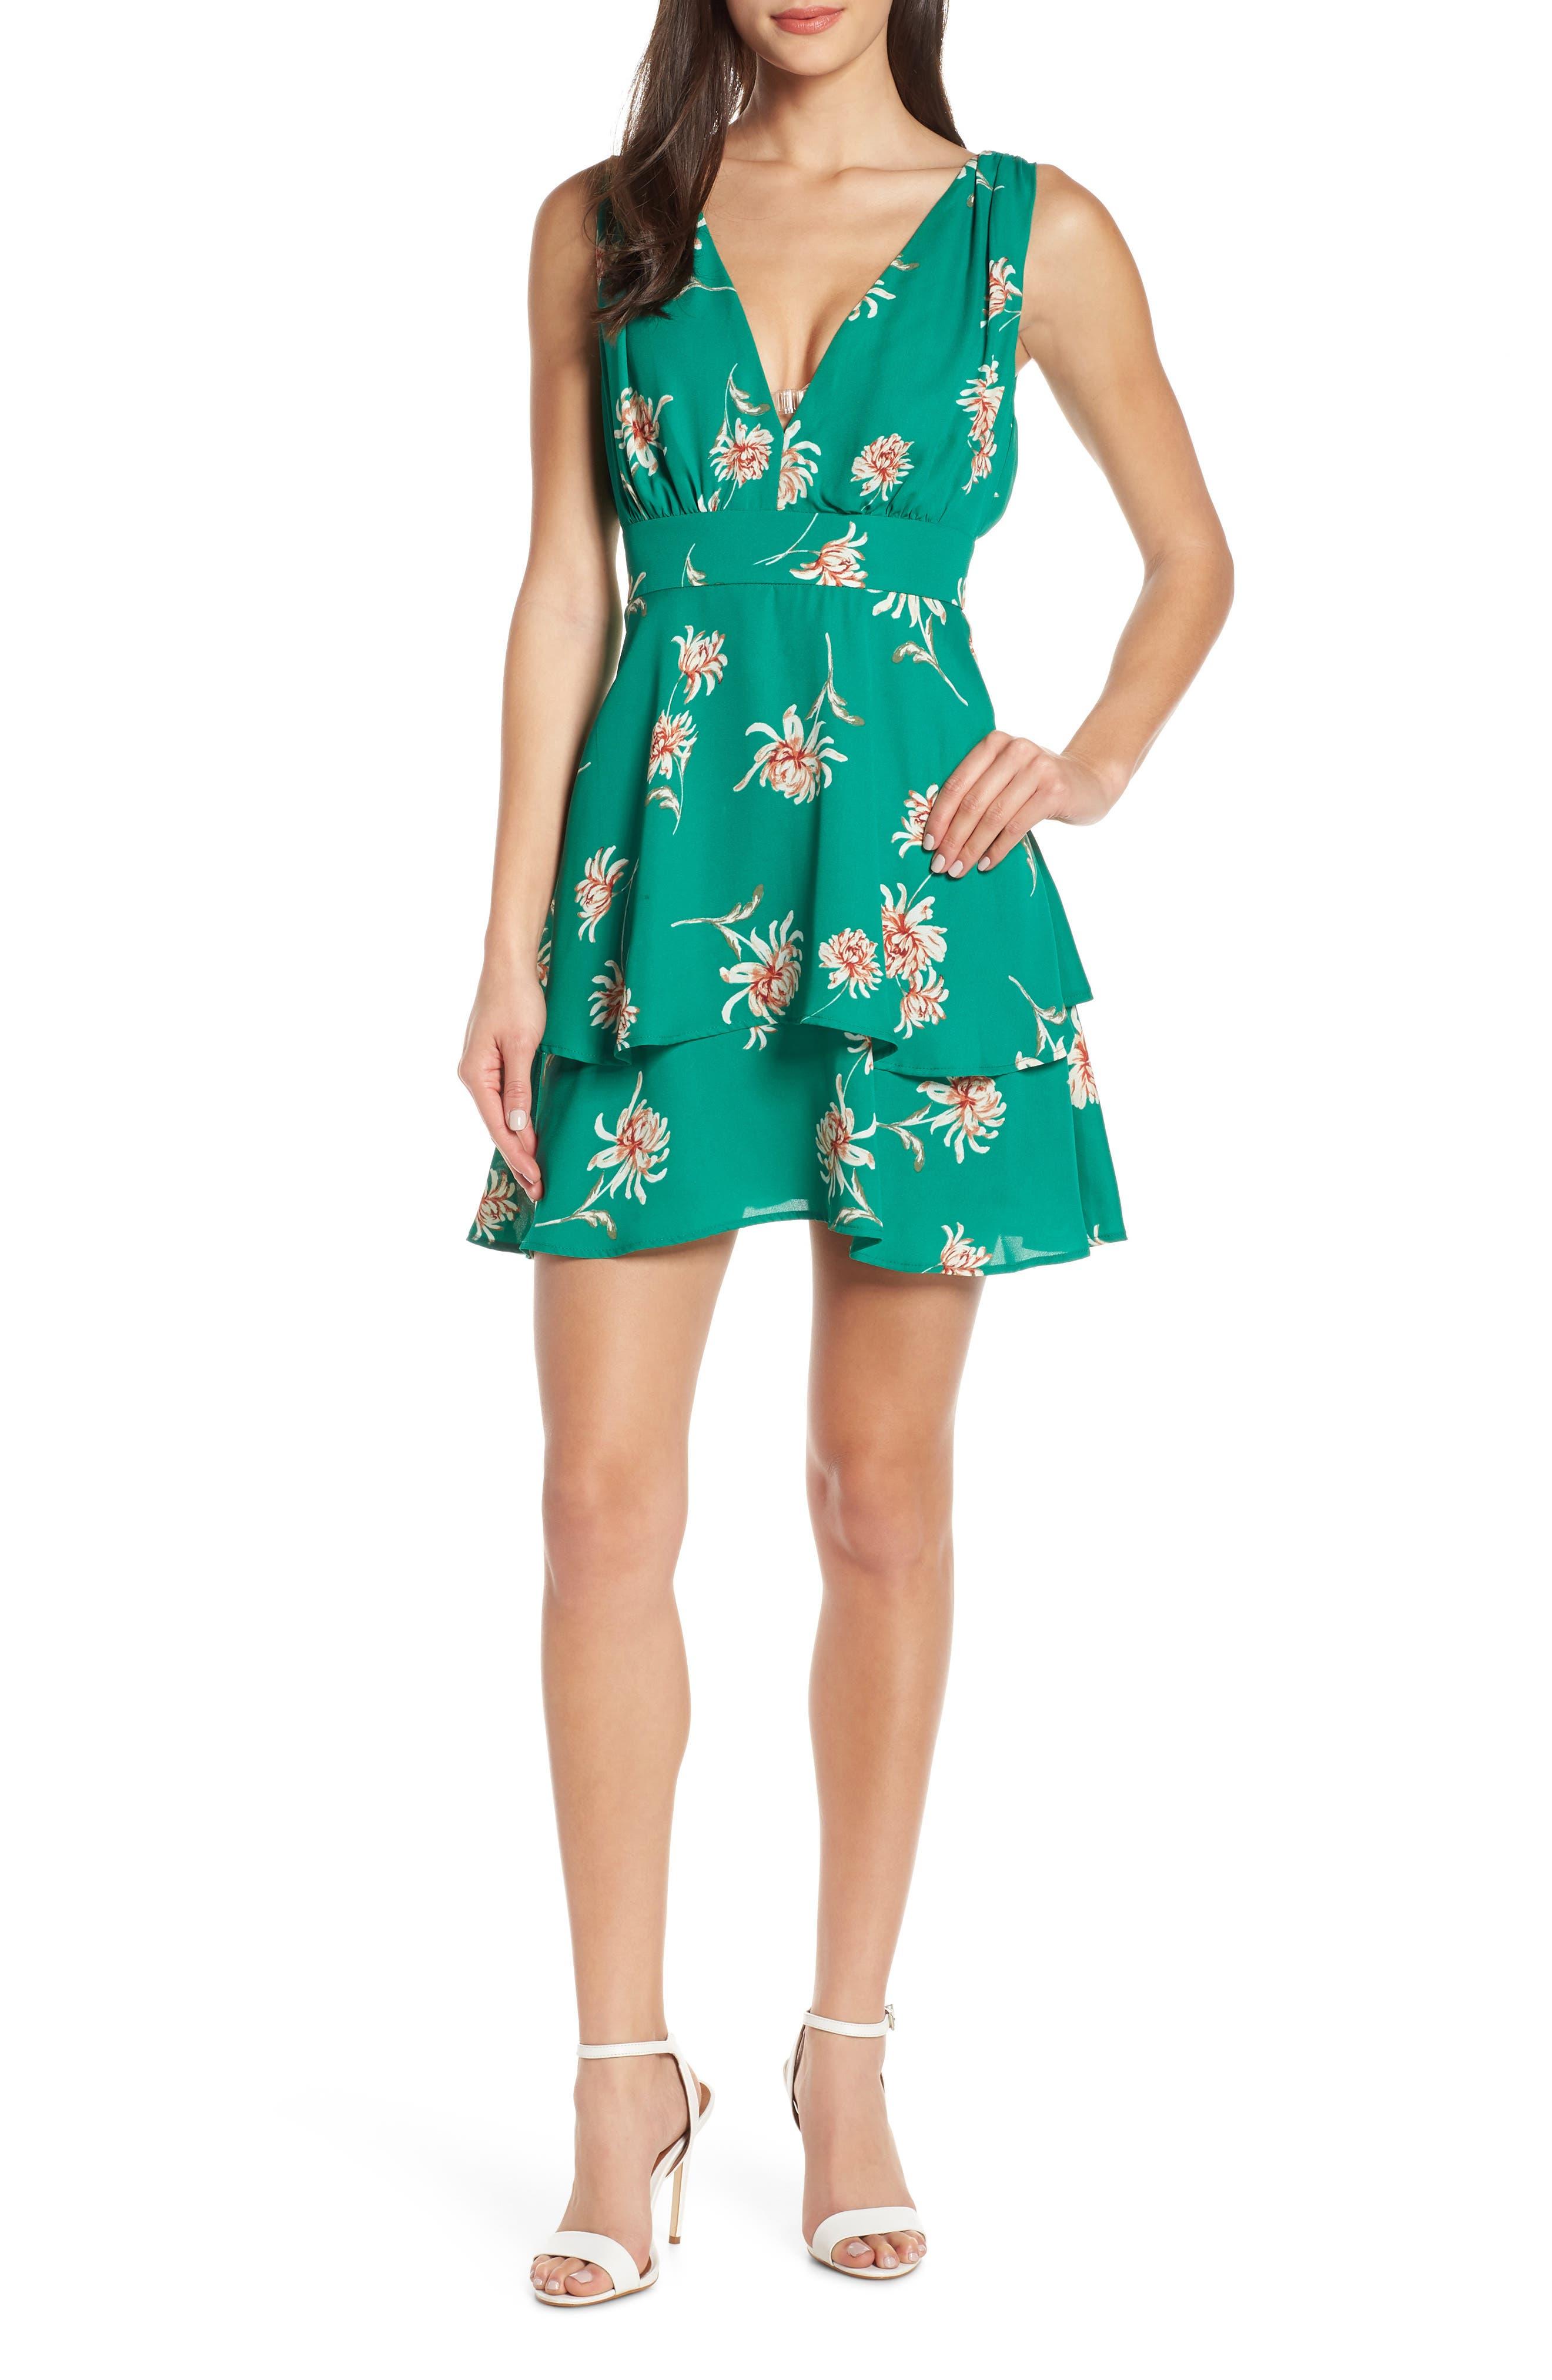 Bb Dakota Garden Strolls Blossom Party Minidress, Green